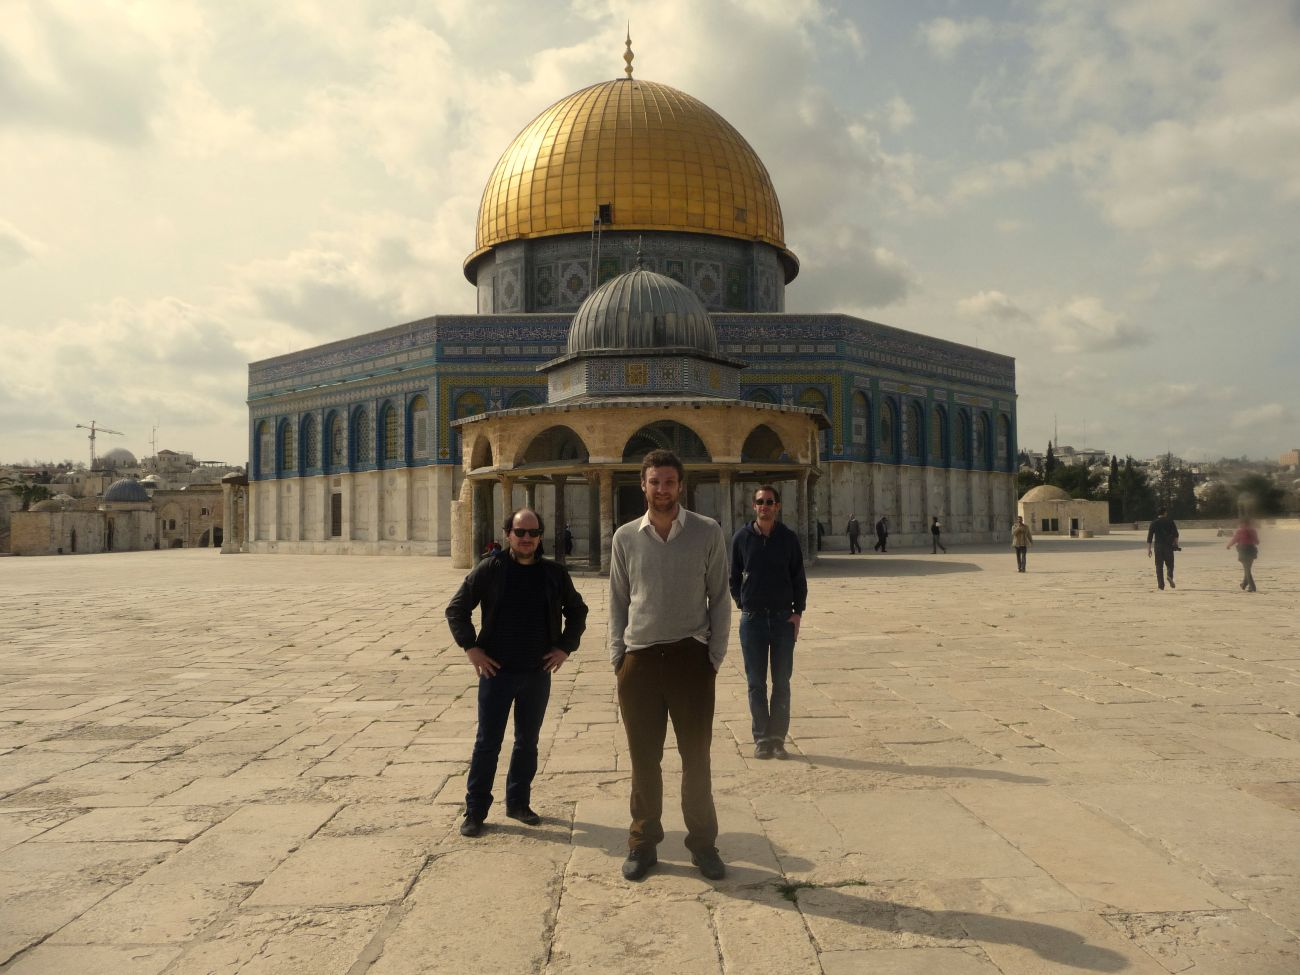 cheveu @ temple mount esplanade des mosquées jerusalem 2010-01 (c) marie alegre_LL92